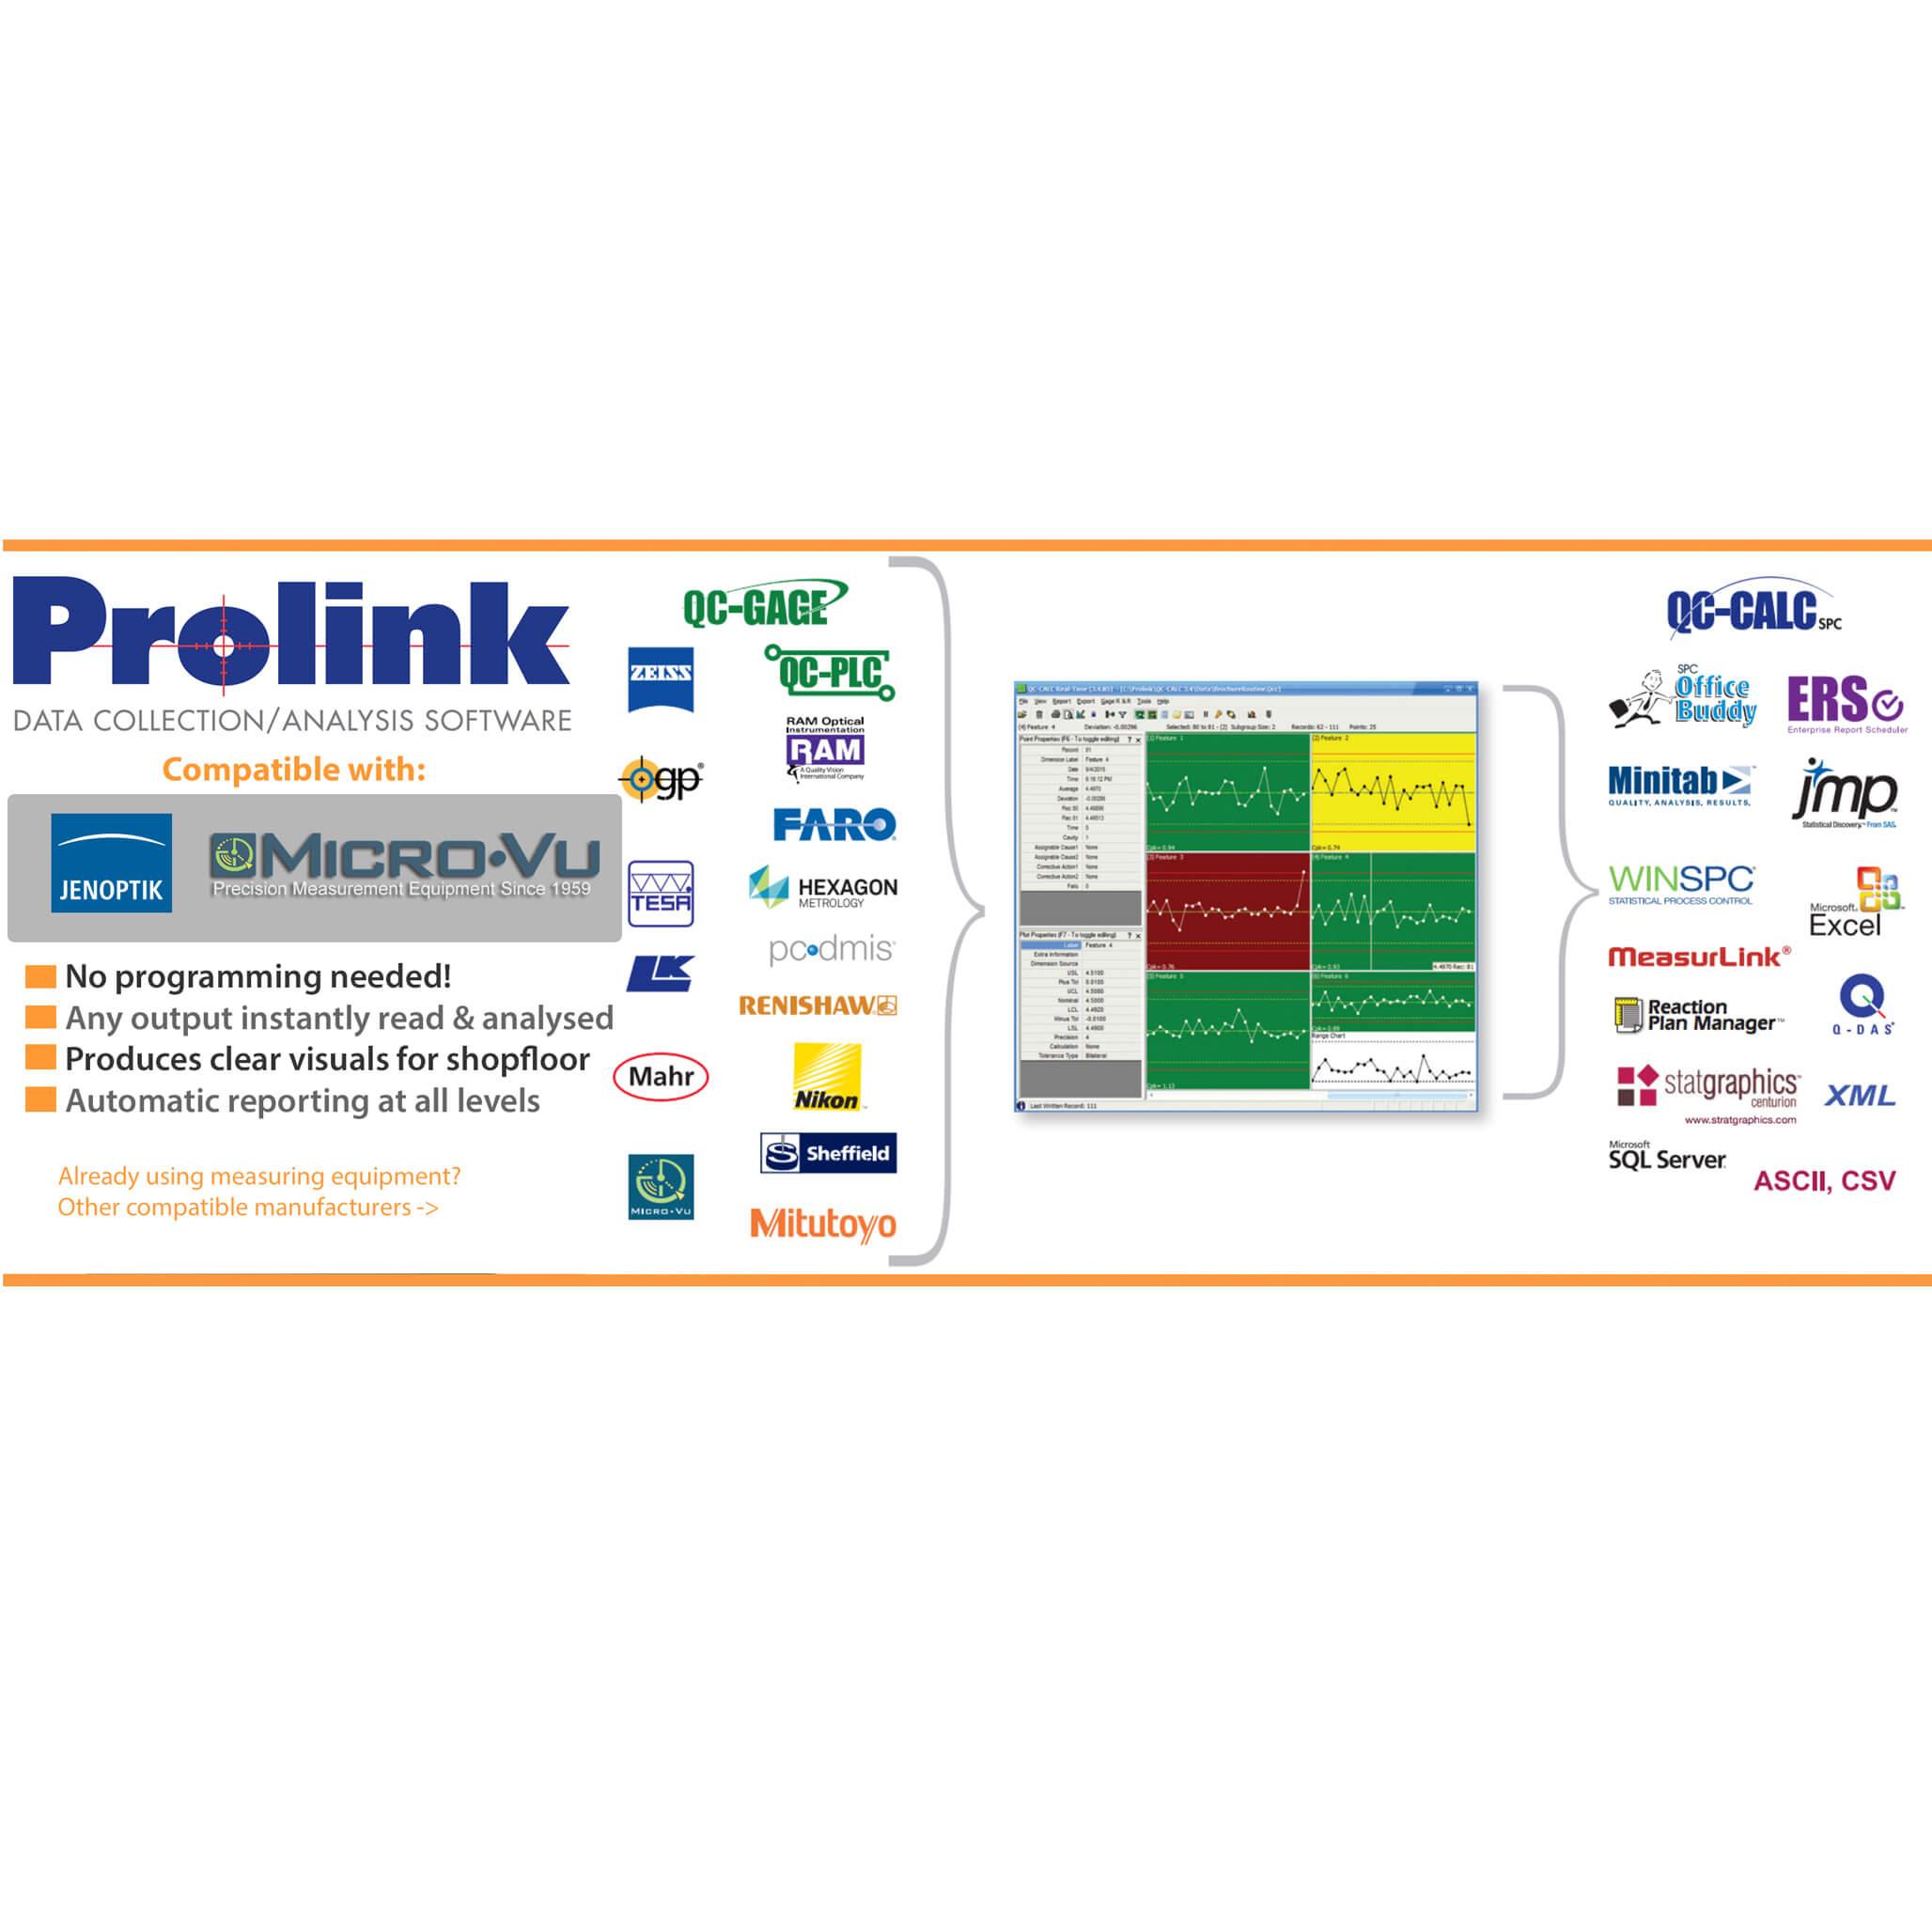 prolink spc software compatibility